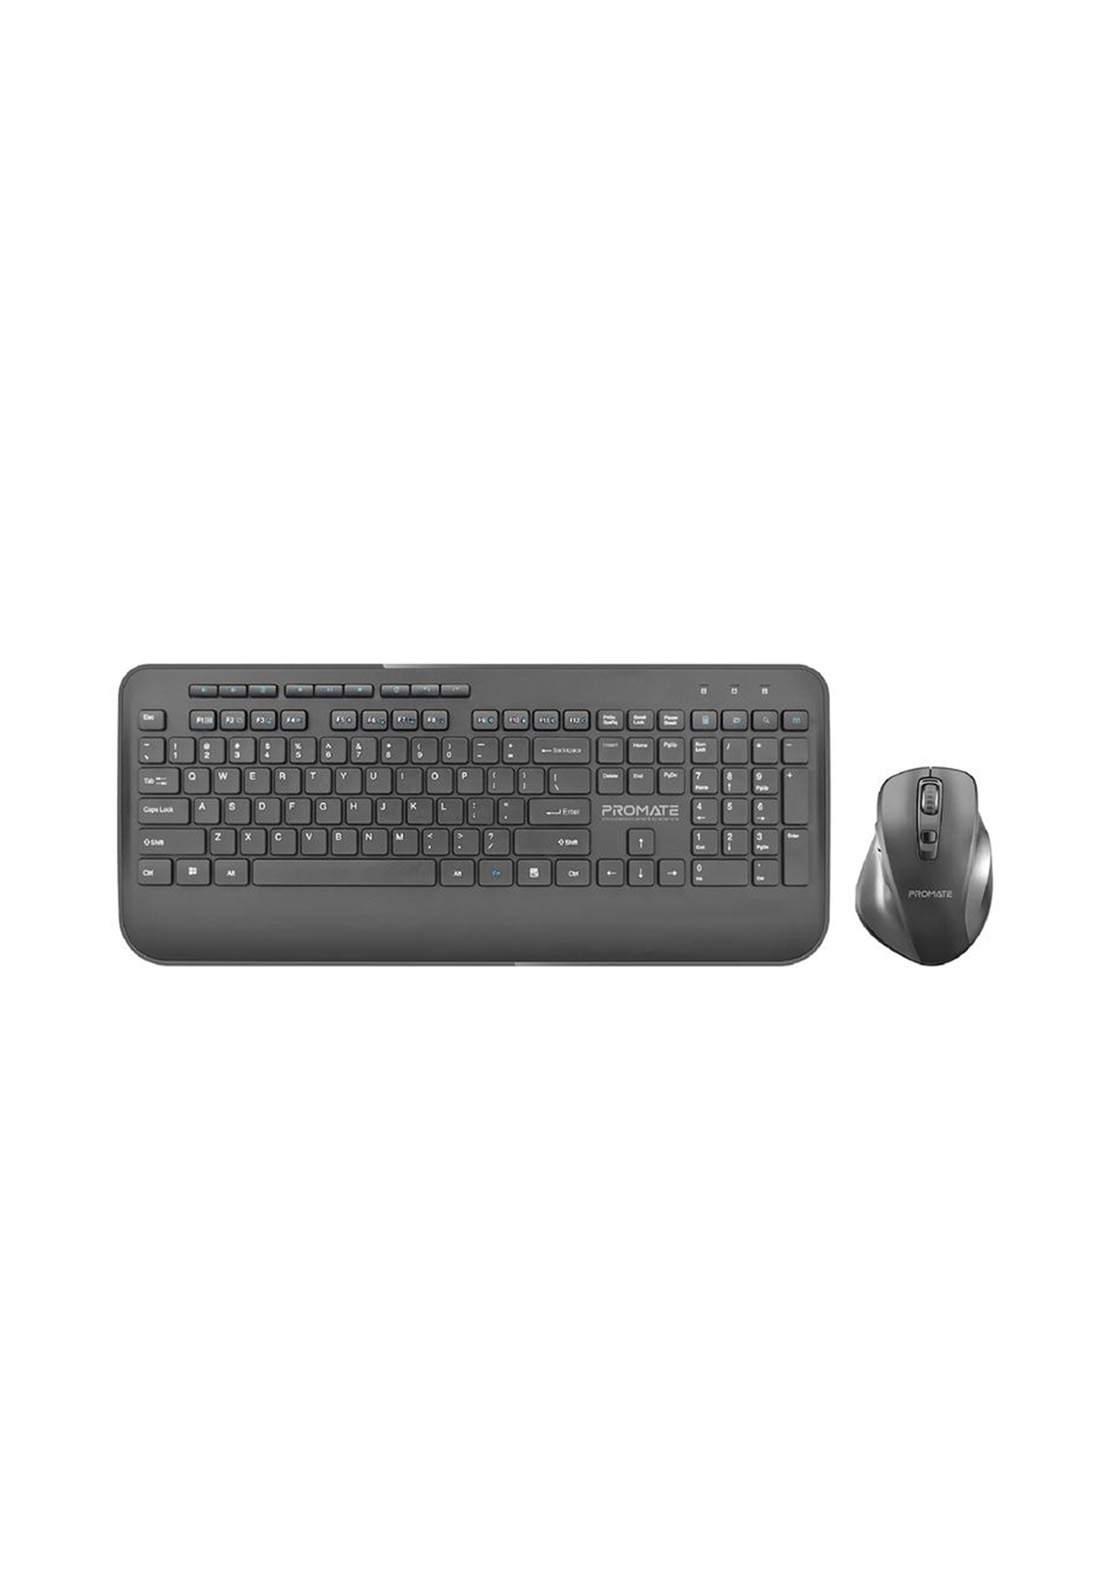 Promate ProCombo-8 Wireless Keyboard and Mouse Combo - Black  لوحة مفاتيح وفارة